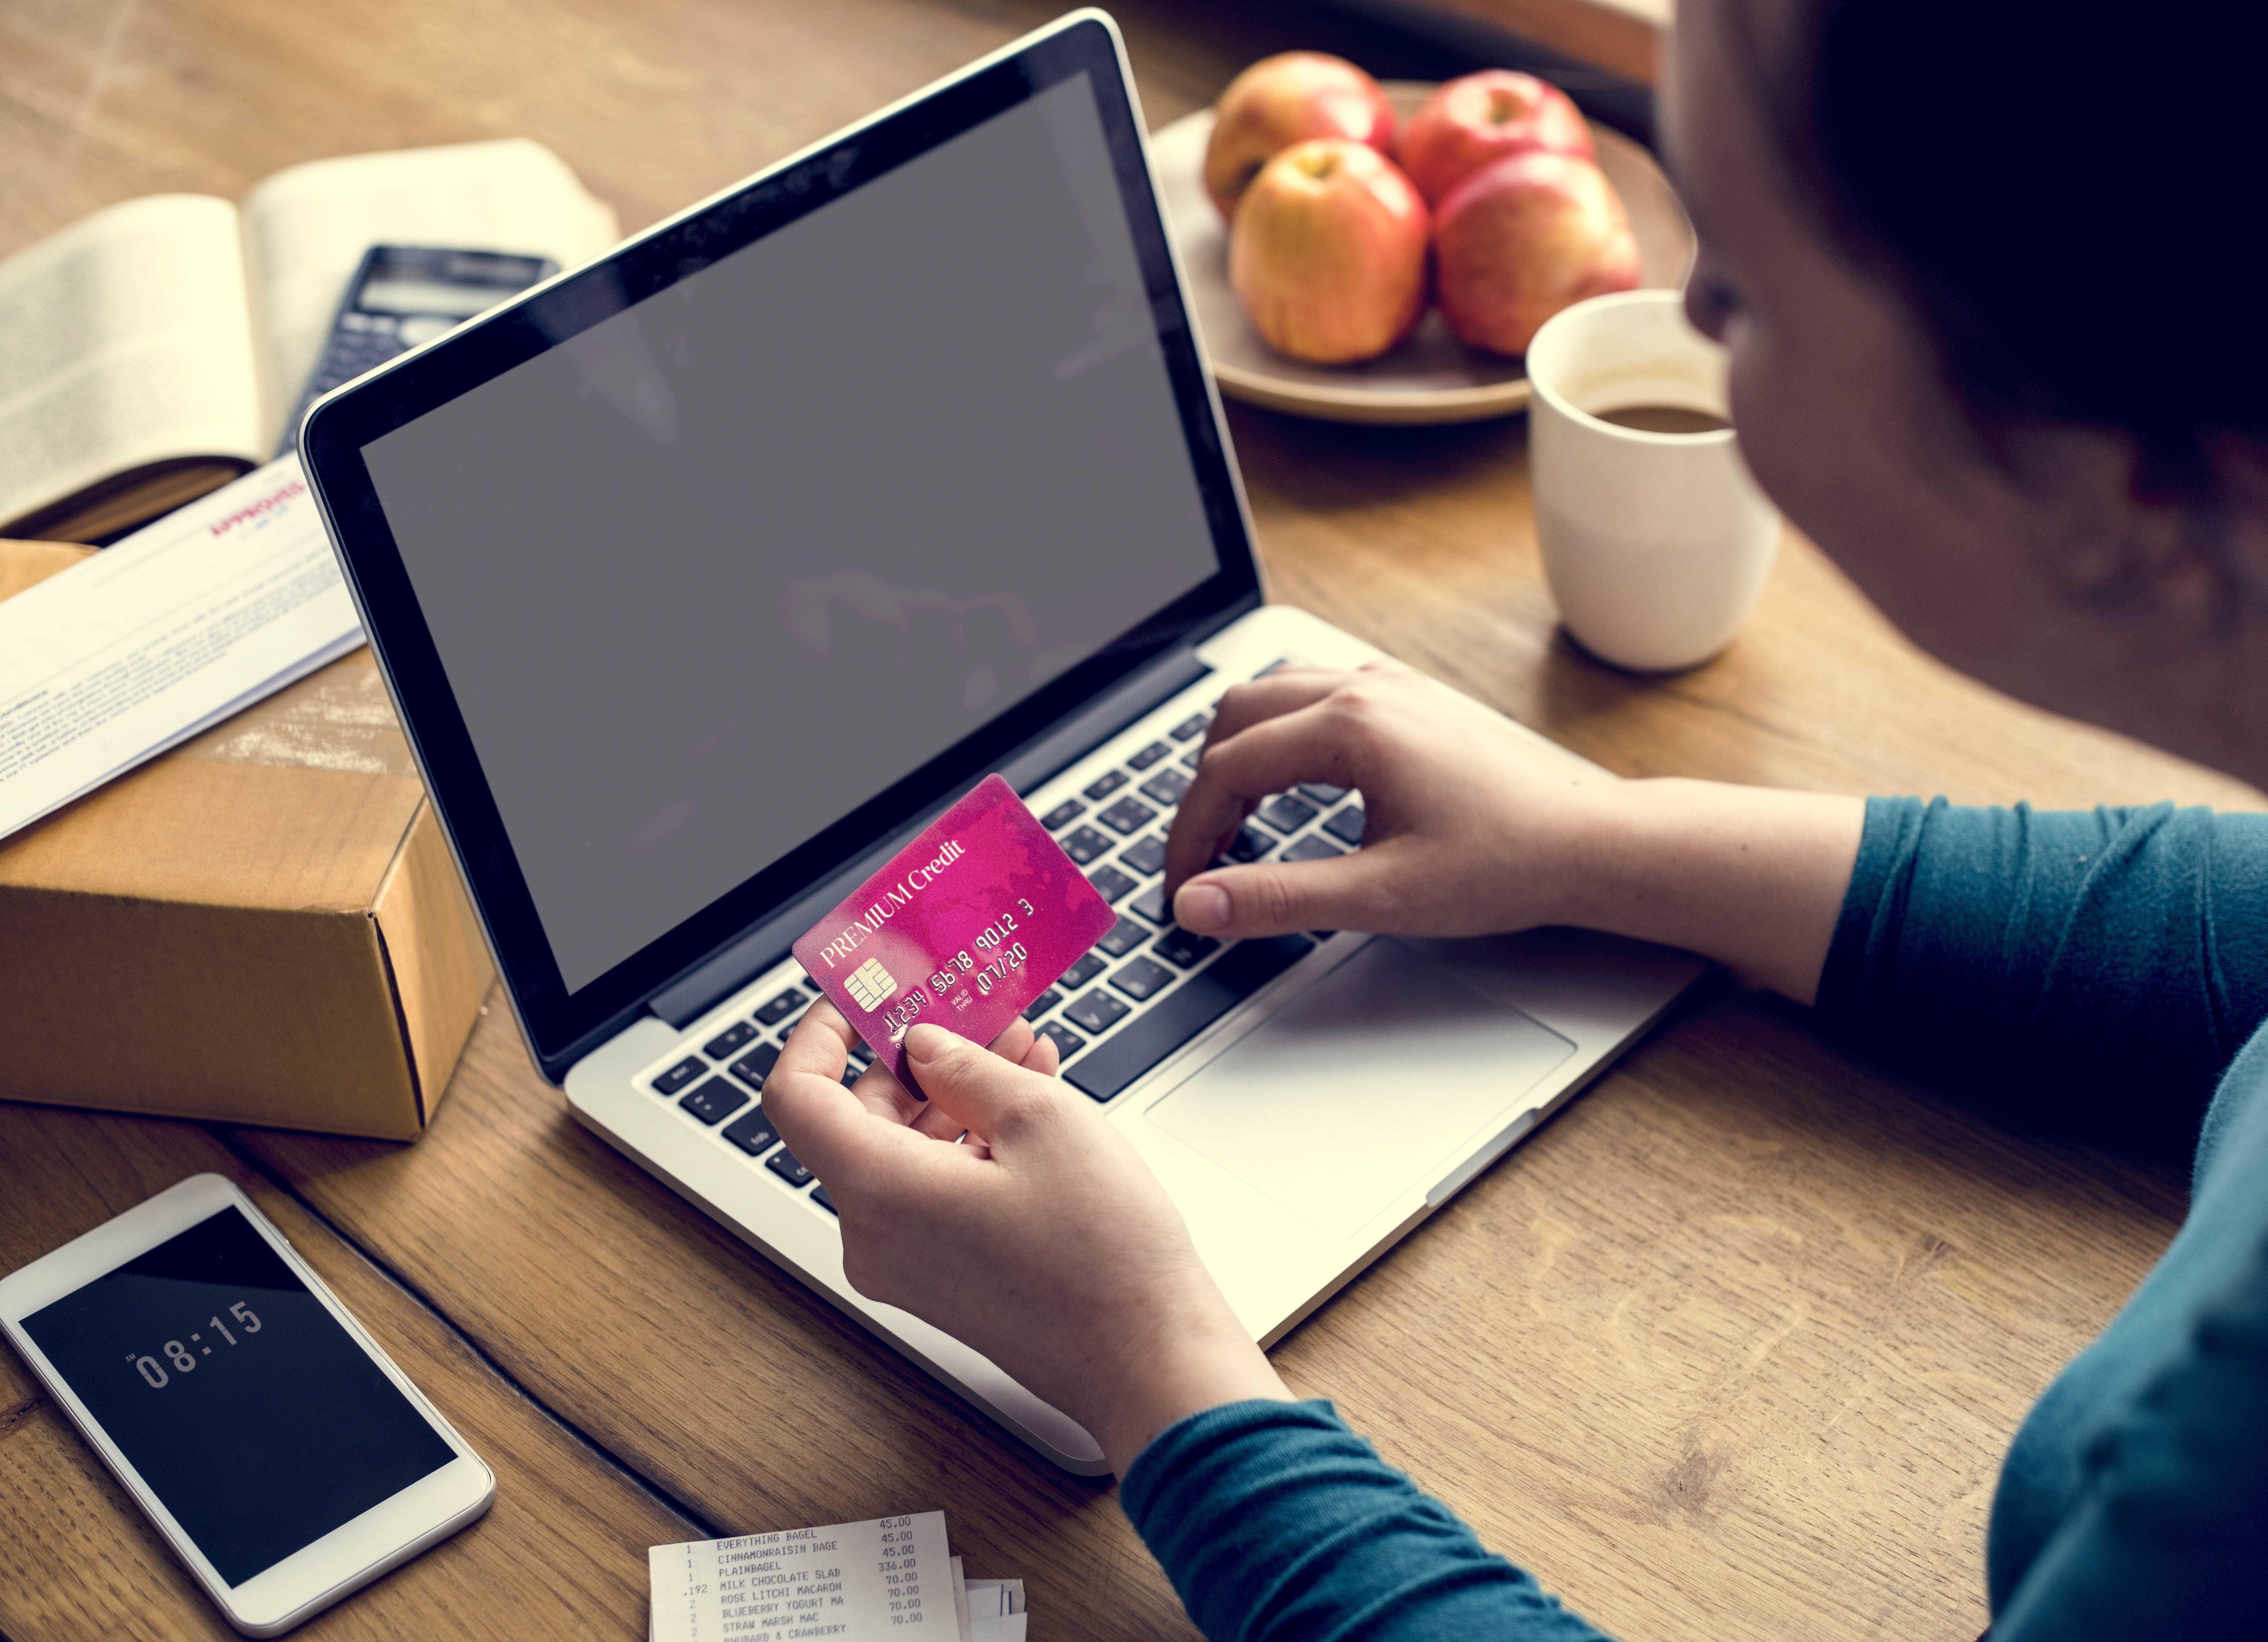 eBay與Amazon如何比較和選擇? |你的產品適合在跨境電商賣嗎? |教你如何快速進軍海外市場 | MeetHub